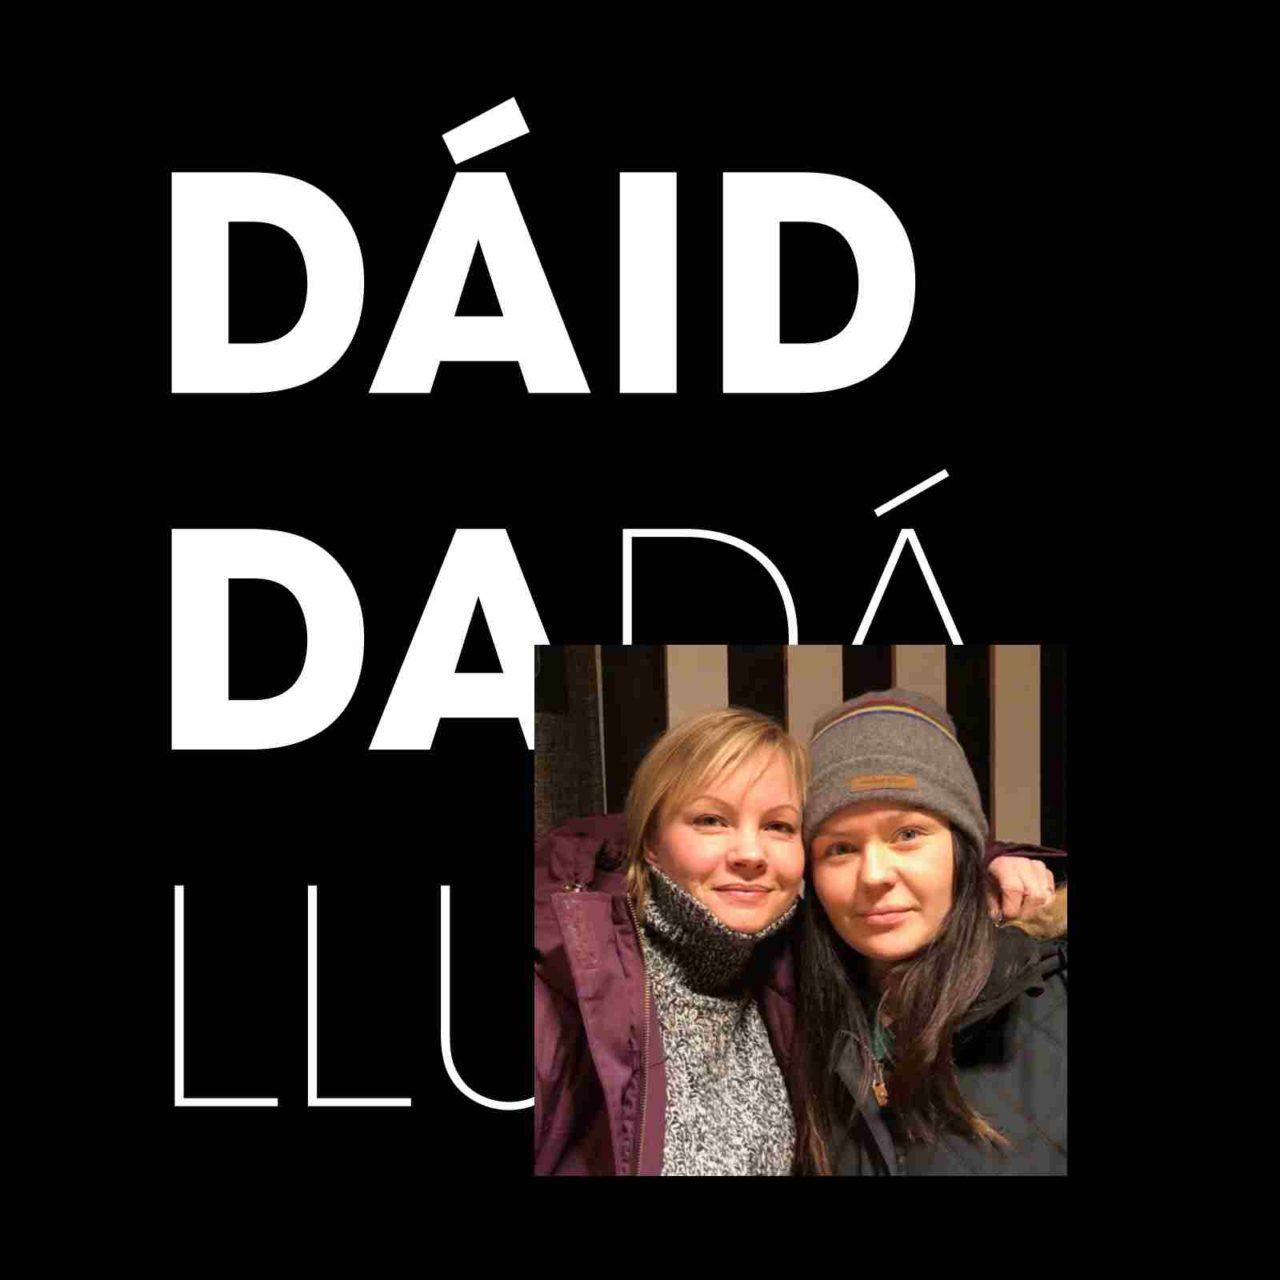 daiddadallu-ellesofe_maret-anna-1280x1280.jpg